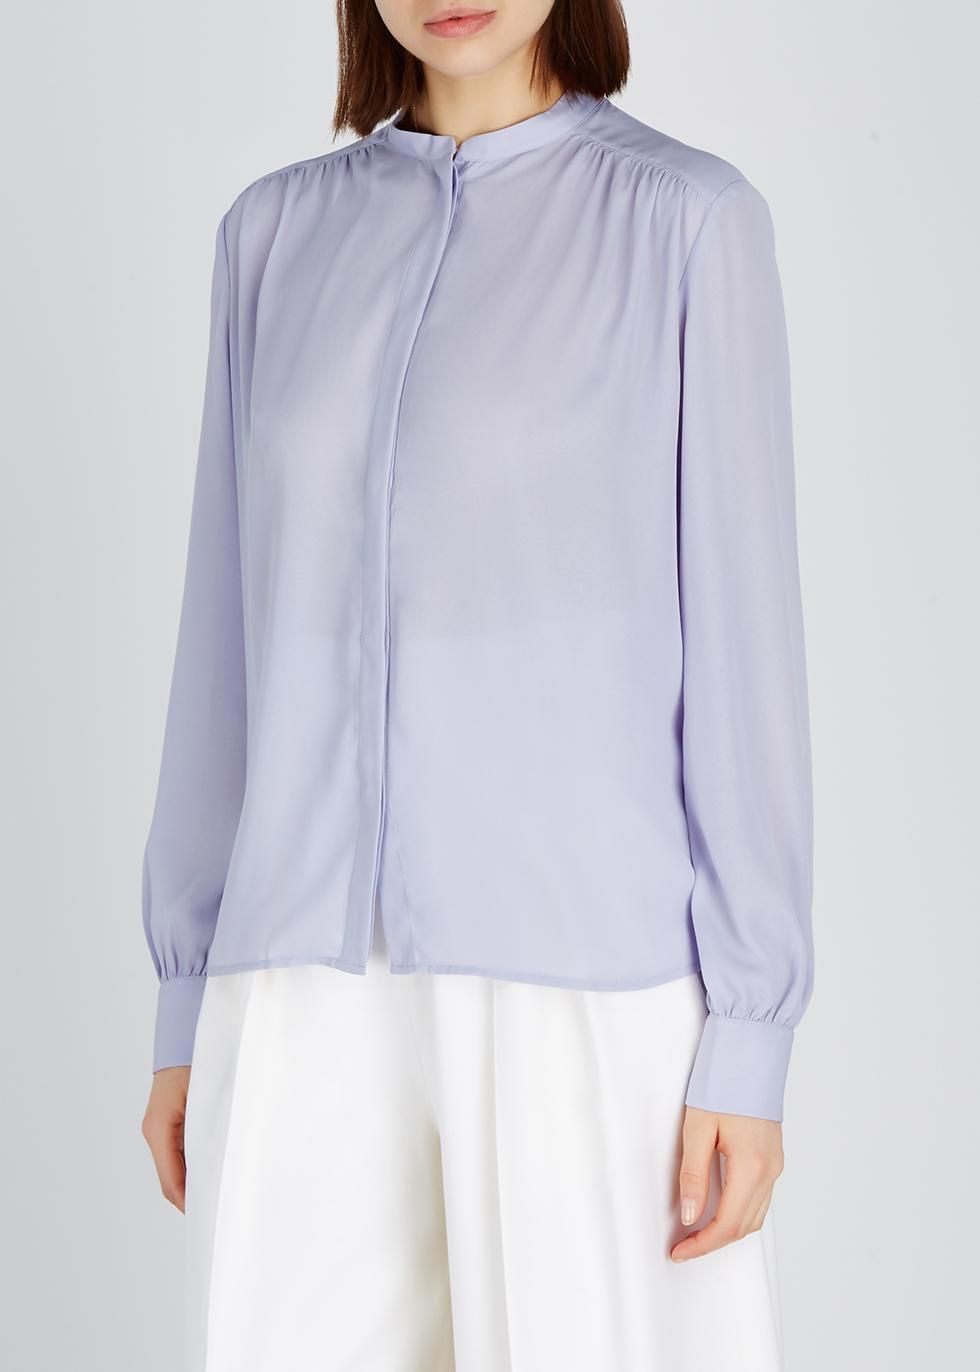 Lilac crepe blouse - Filippa K